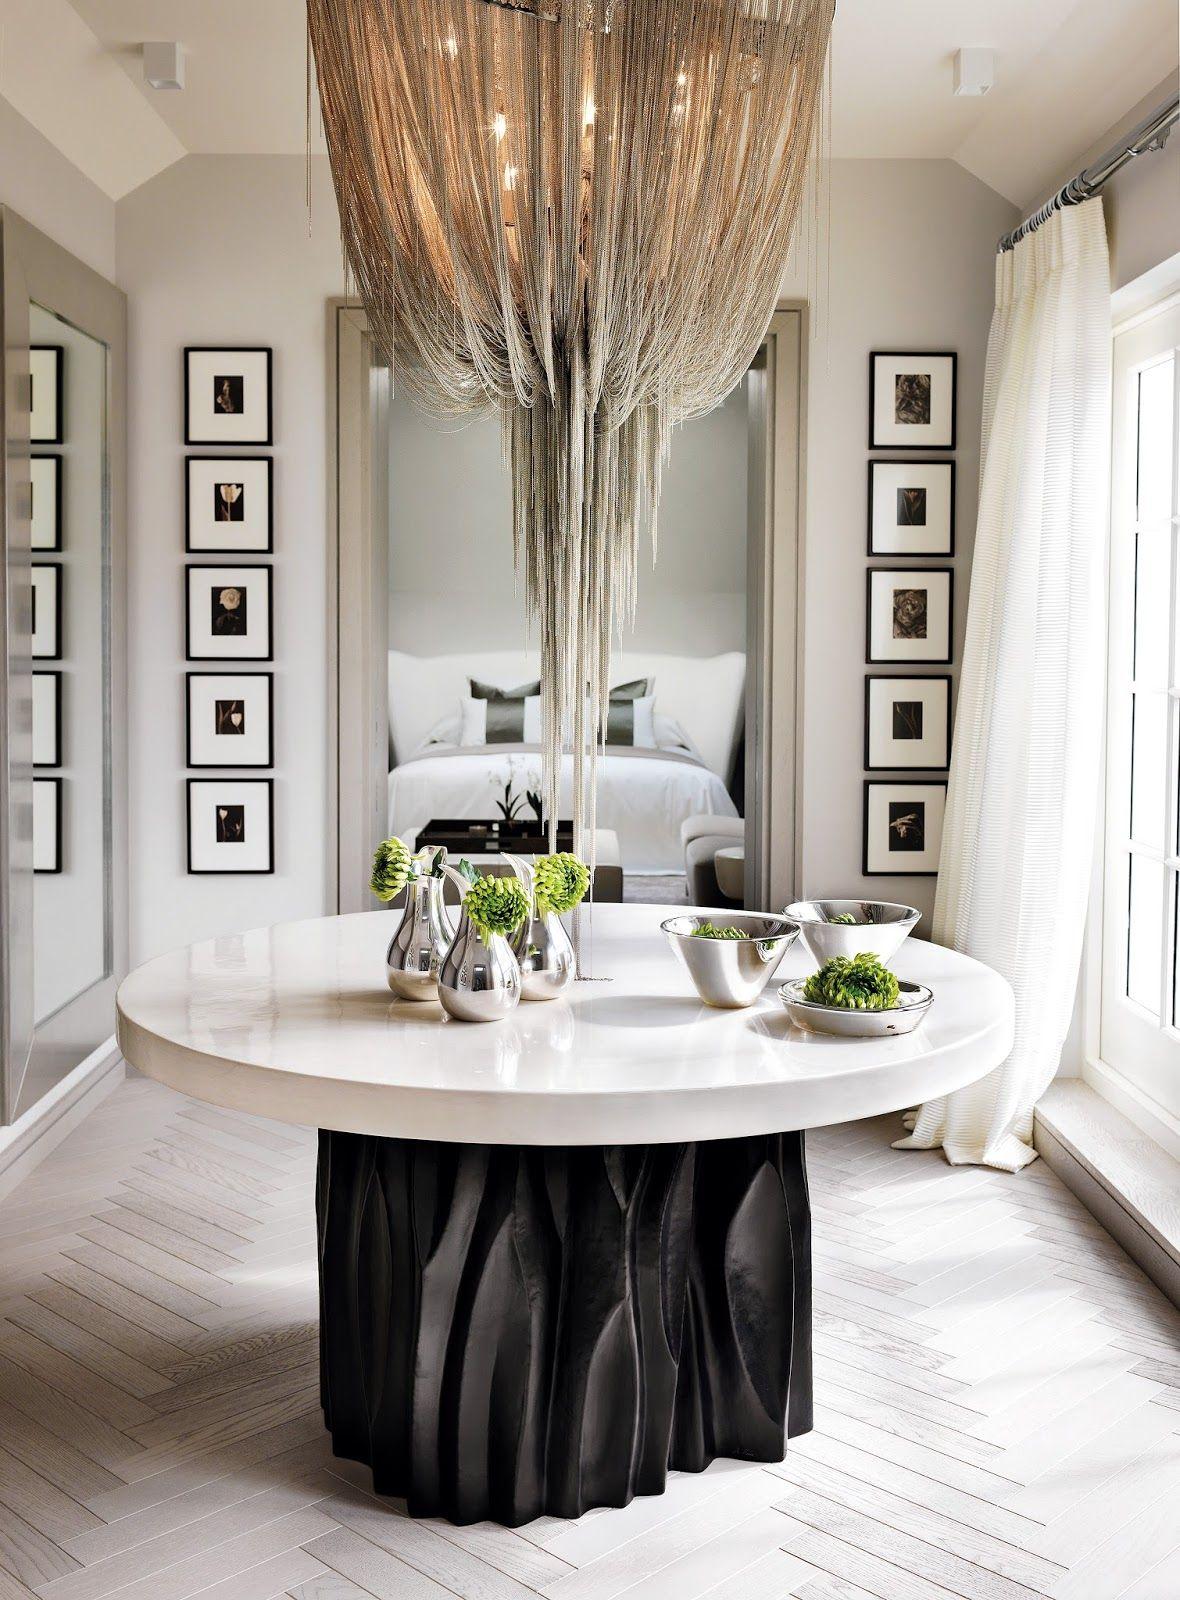 Kelly Hoppen The Art Of Interior Design By Rizzoli New York 60 00 Reviewed Teresa Hatfield Author Splendid Sa